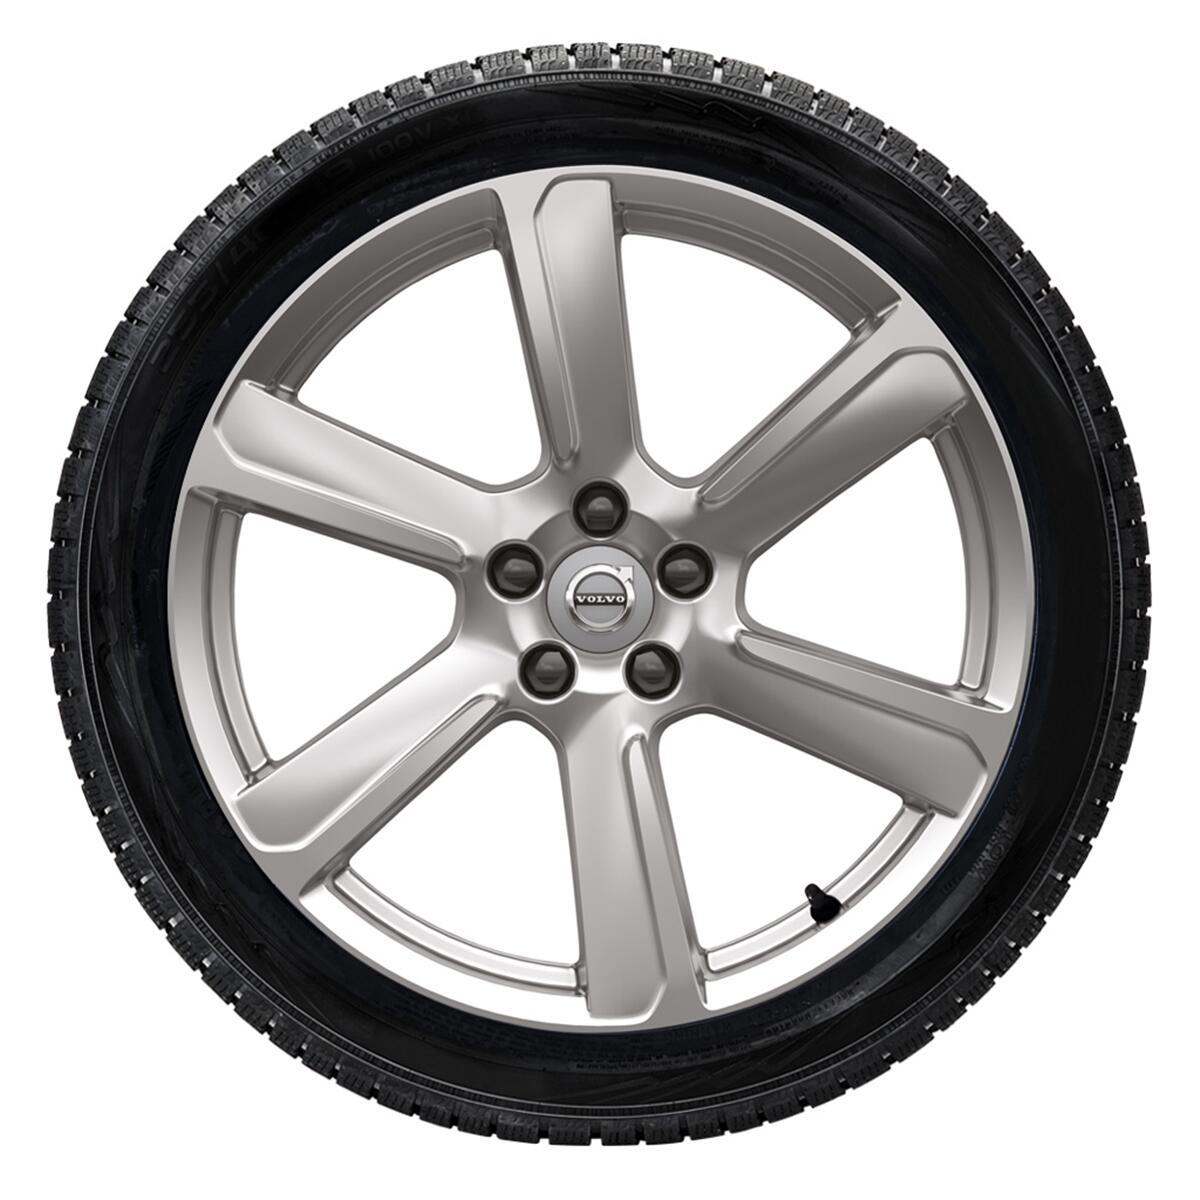 "Komplet zimskih točkova19""; gume Pirelli"